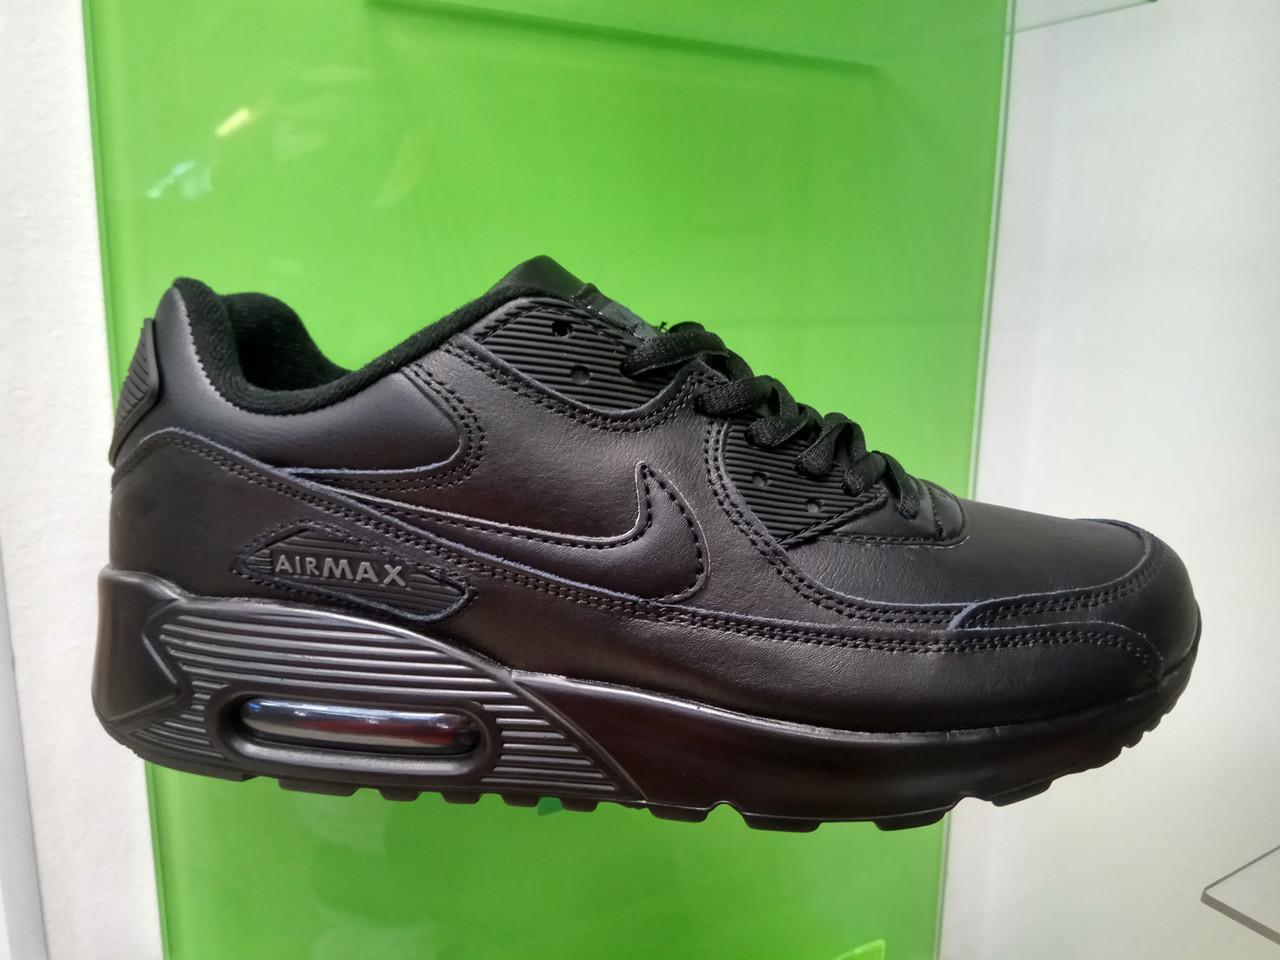 13152843 Мужские кроссовки Nike Air Max 90 Leather black - Интернет магазин  krossovkiweb.kiev.ua